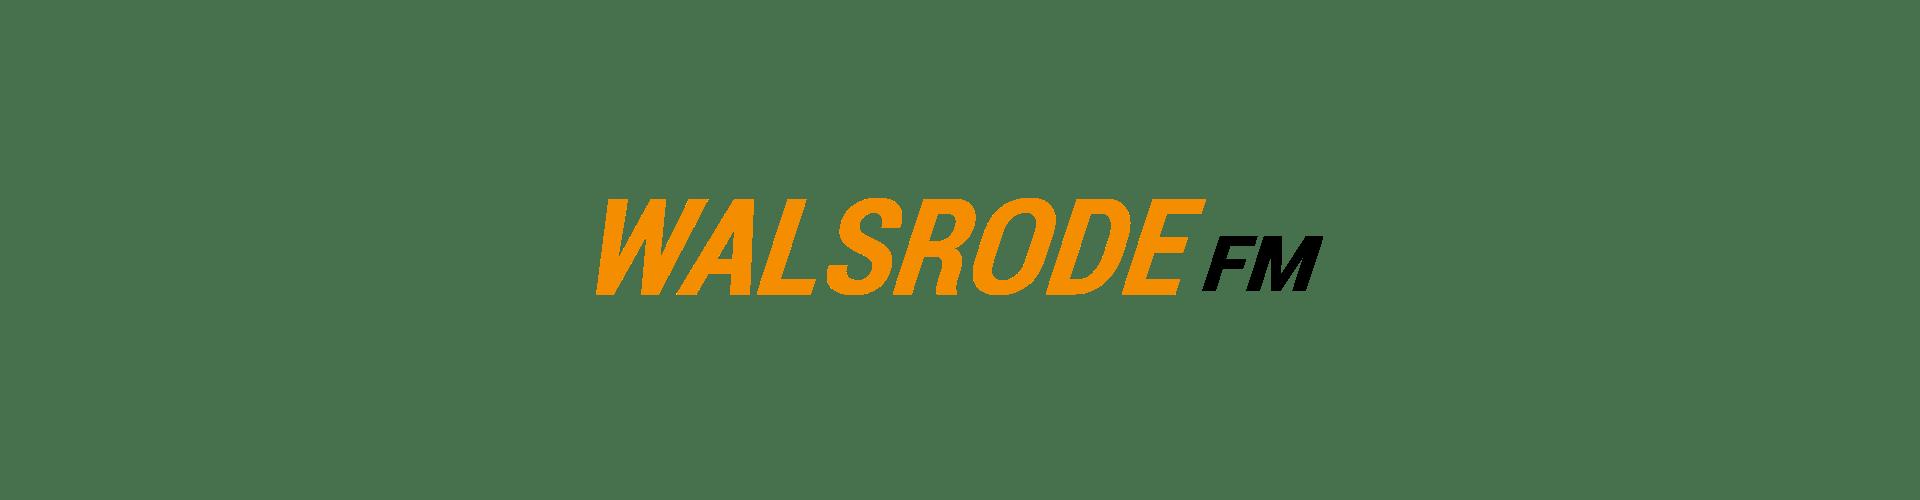 Walsrode FM